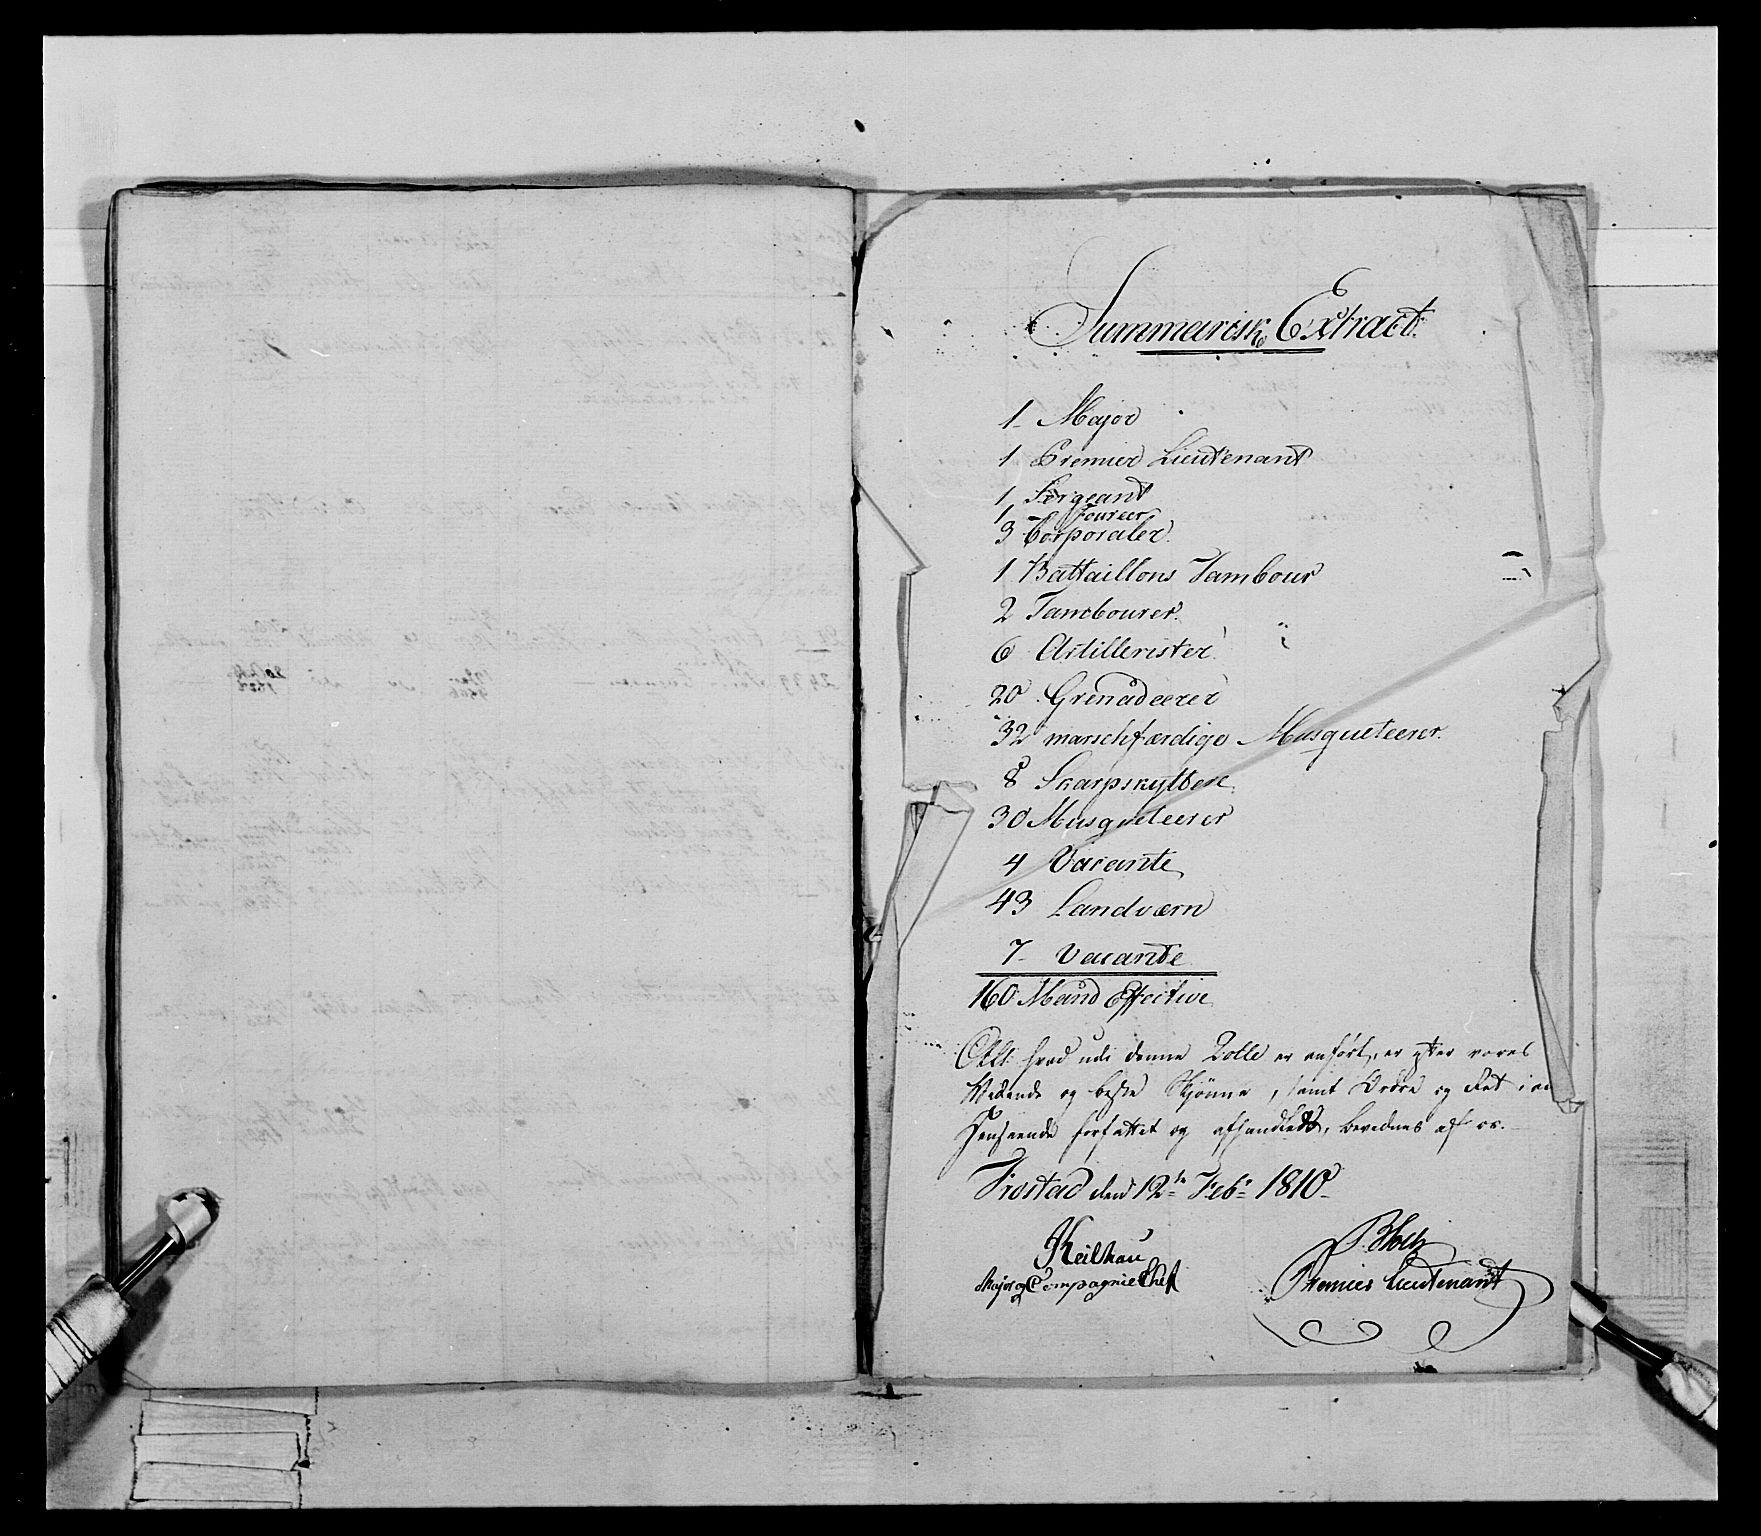 RA, Generalitets- og kommissariatskollegiet, Det kongelige norske kommissariatskollegium, E/Eh/L0069: Opplandske gevorbne infanteriregiment, 1810-1818, s. 780